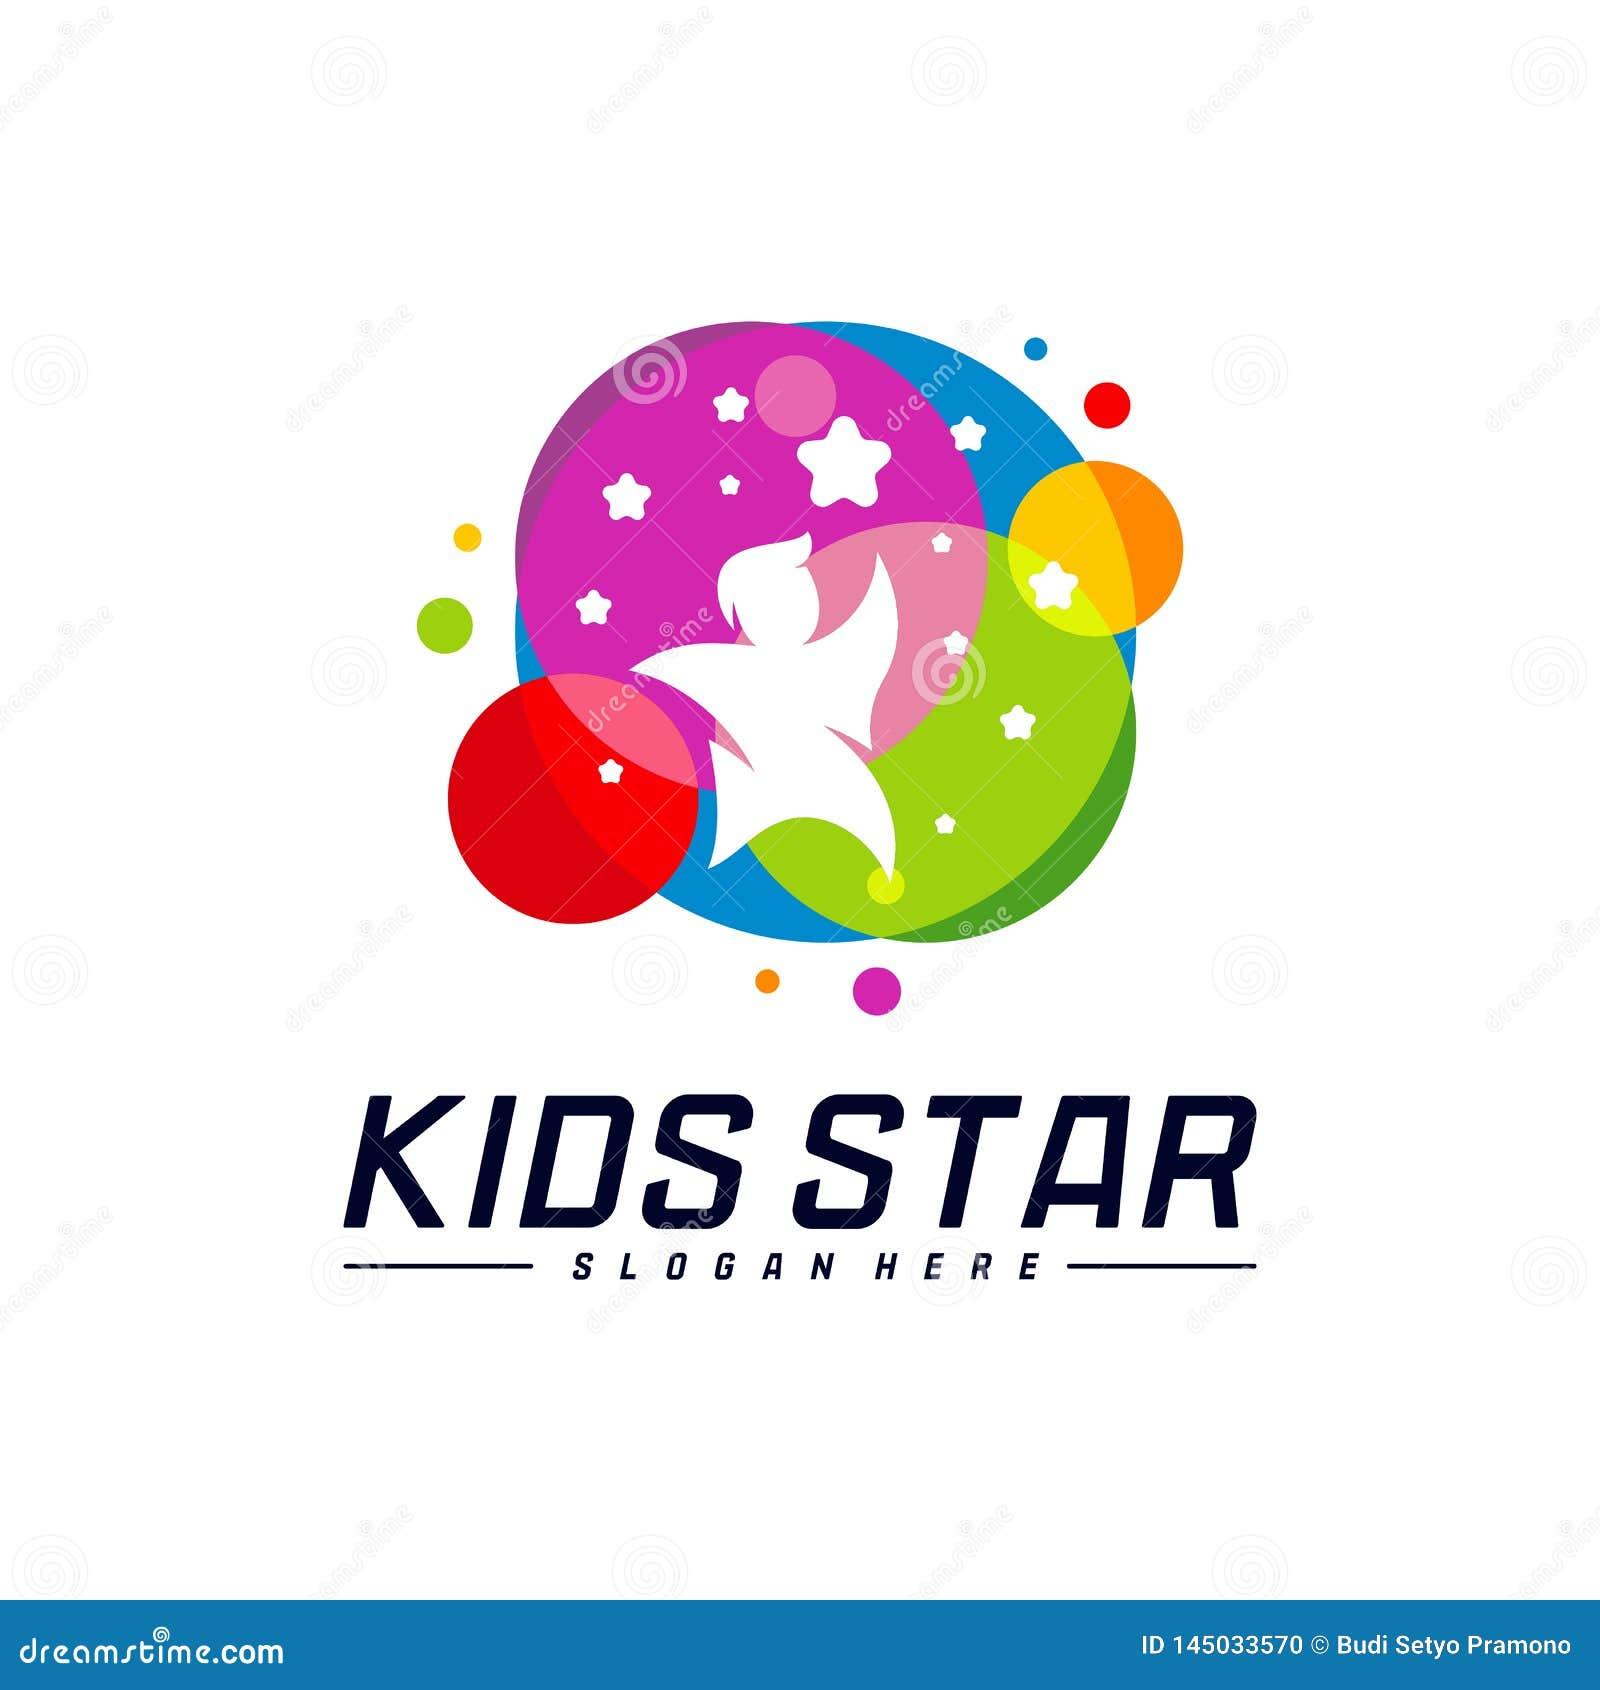 Reaching Stars Logo Design Template. Dream star logo. Kids Star Concept, Colorful, Creative Symbol